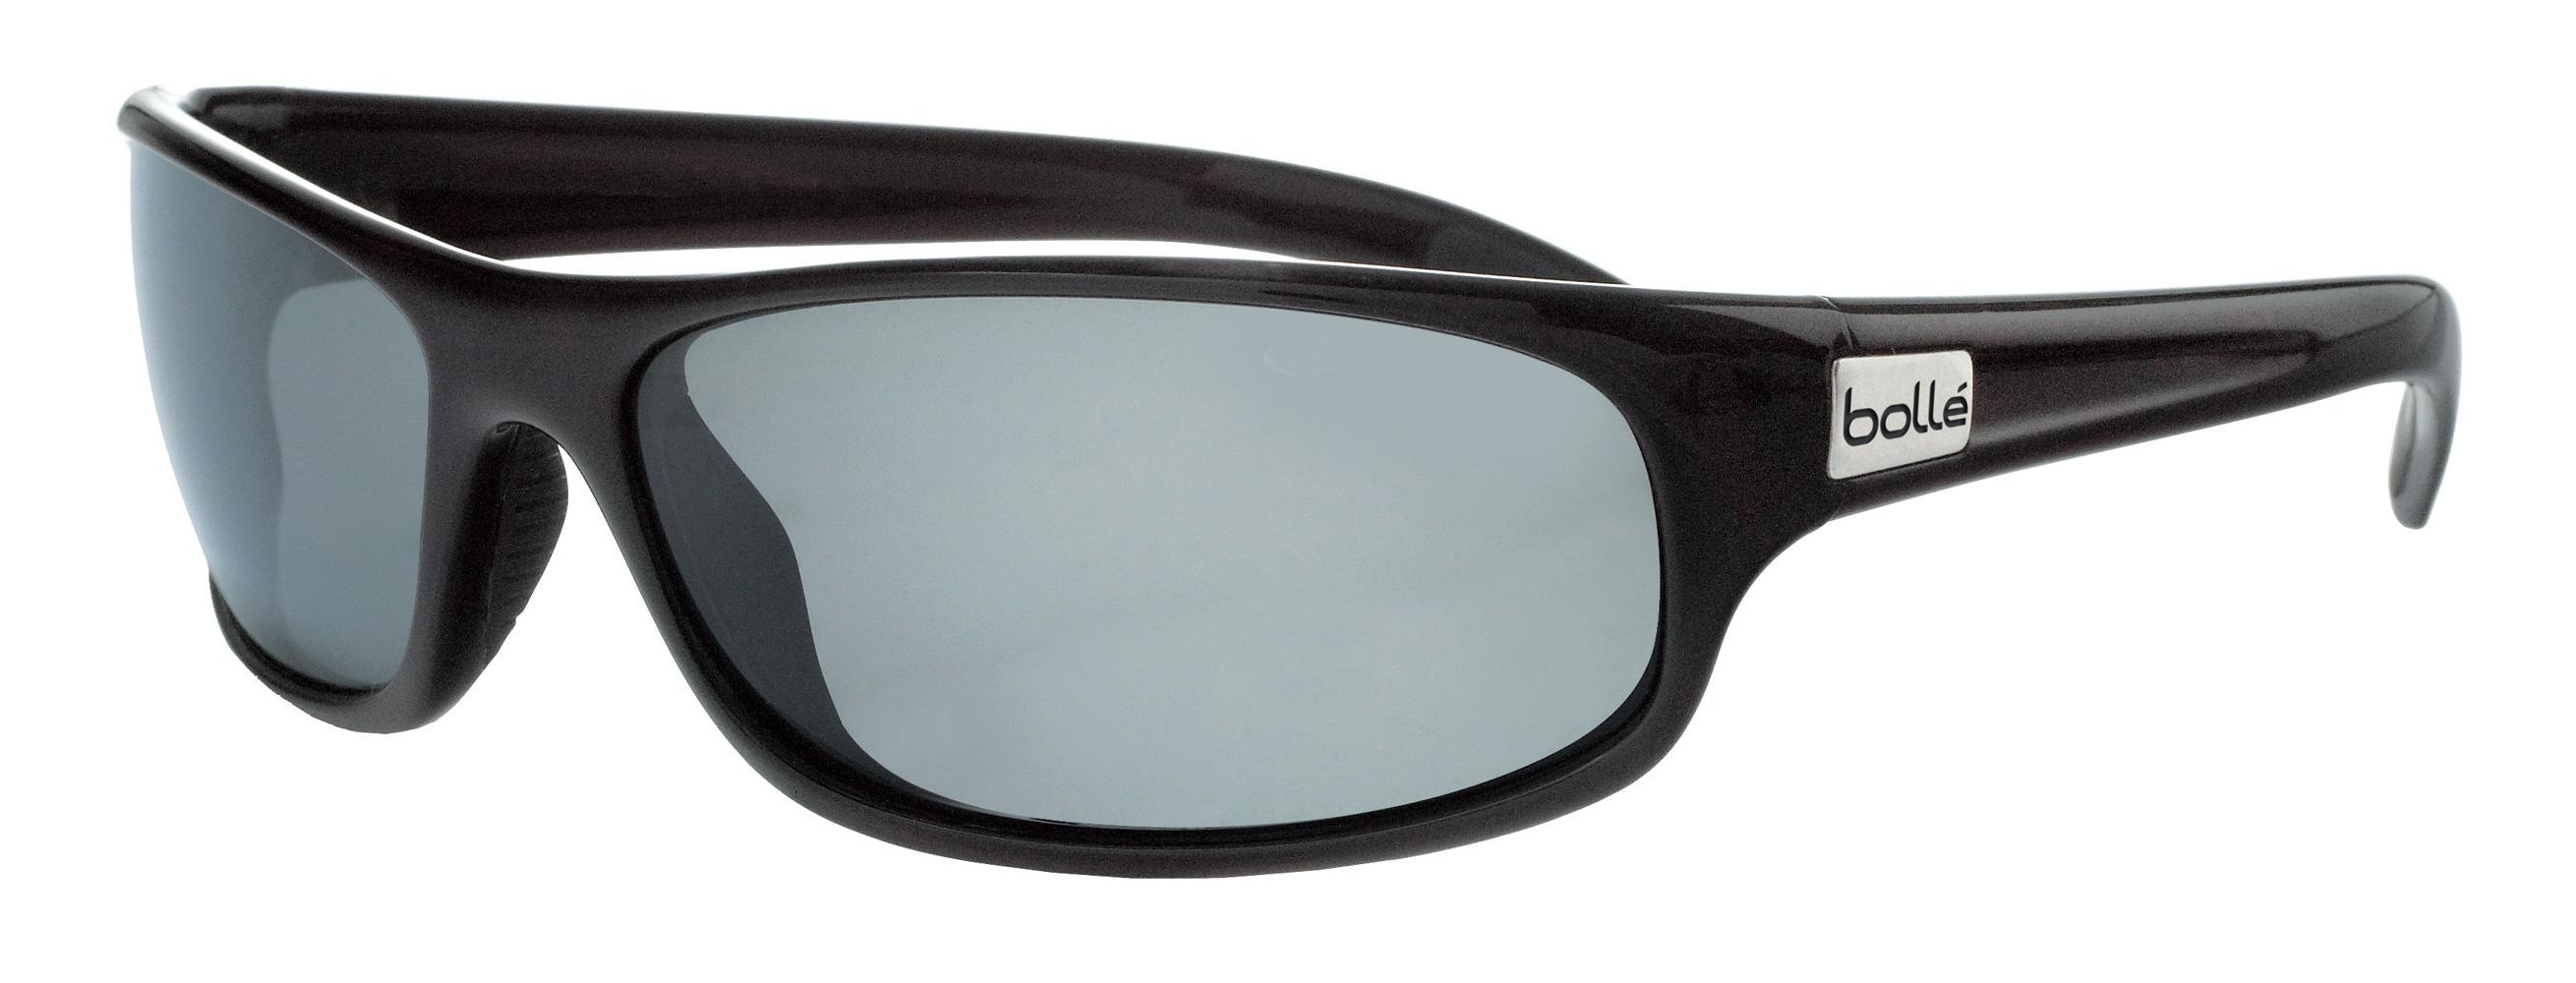 afd382d86bcf1 Bolle Snakes Anaconda Sunglasses - Men's